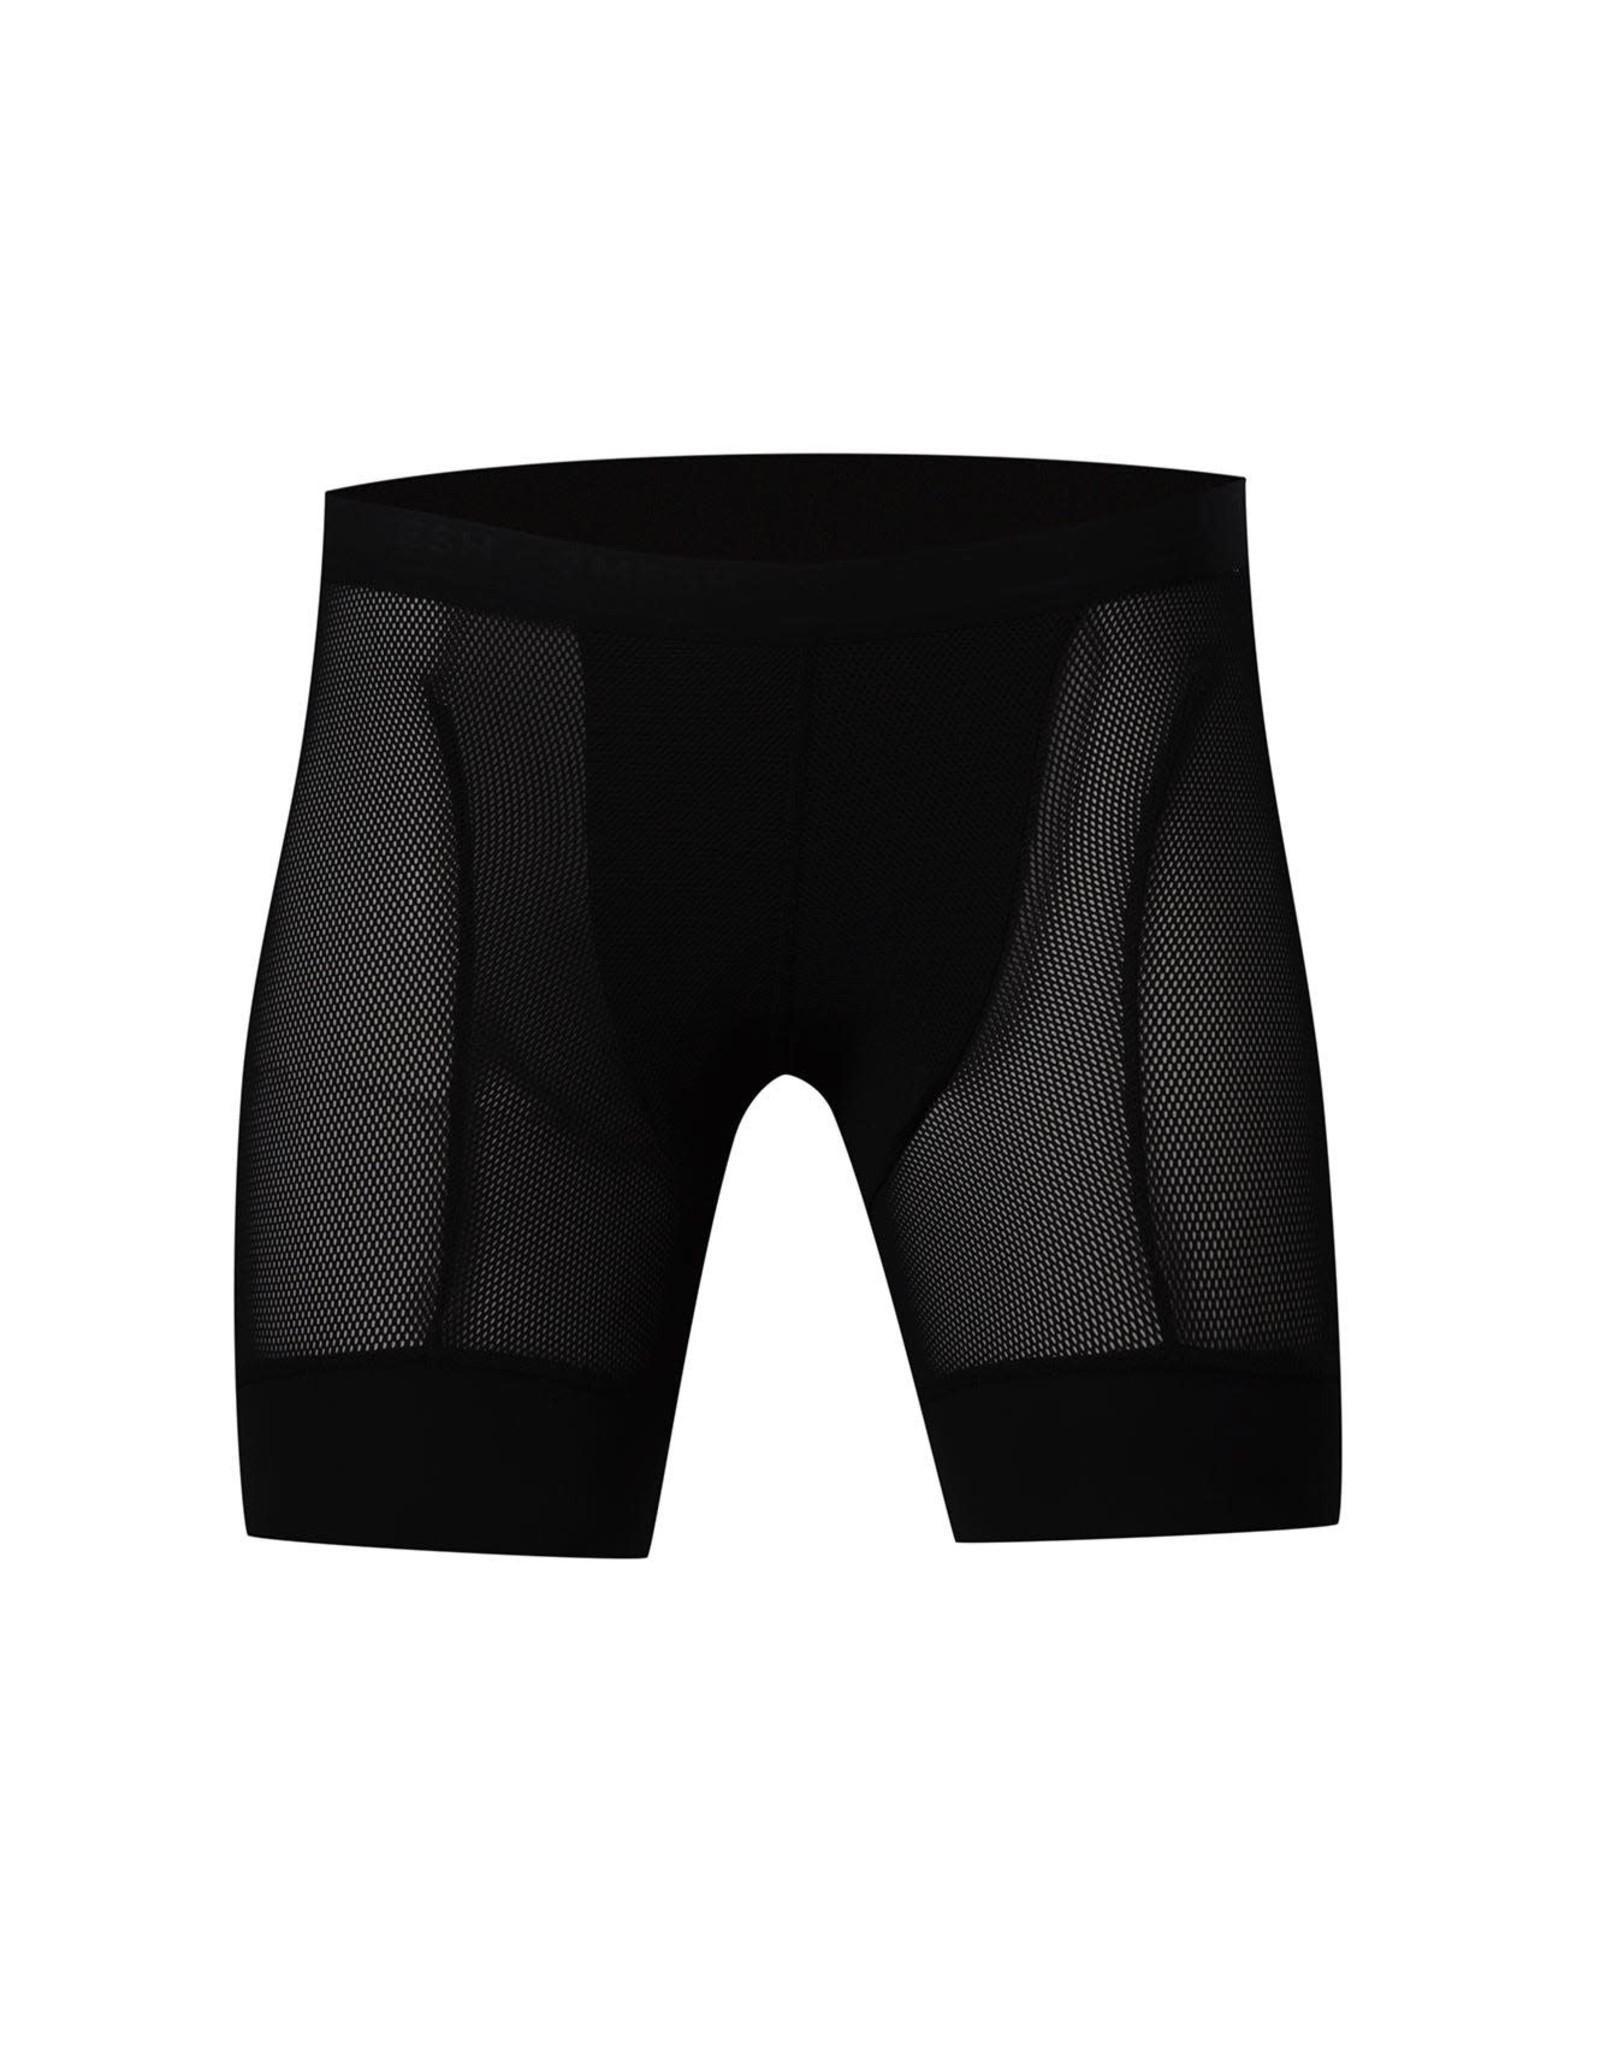 7MESH 7MESH - Foundation Shorts Womens LRG